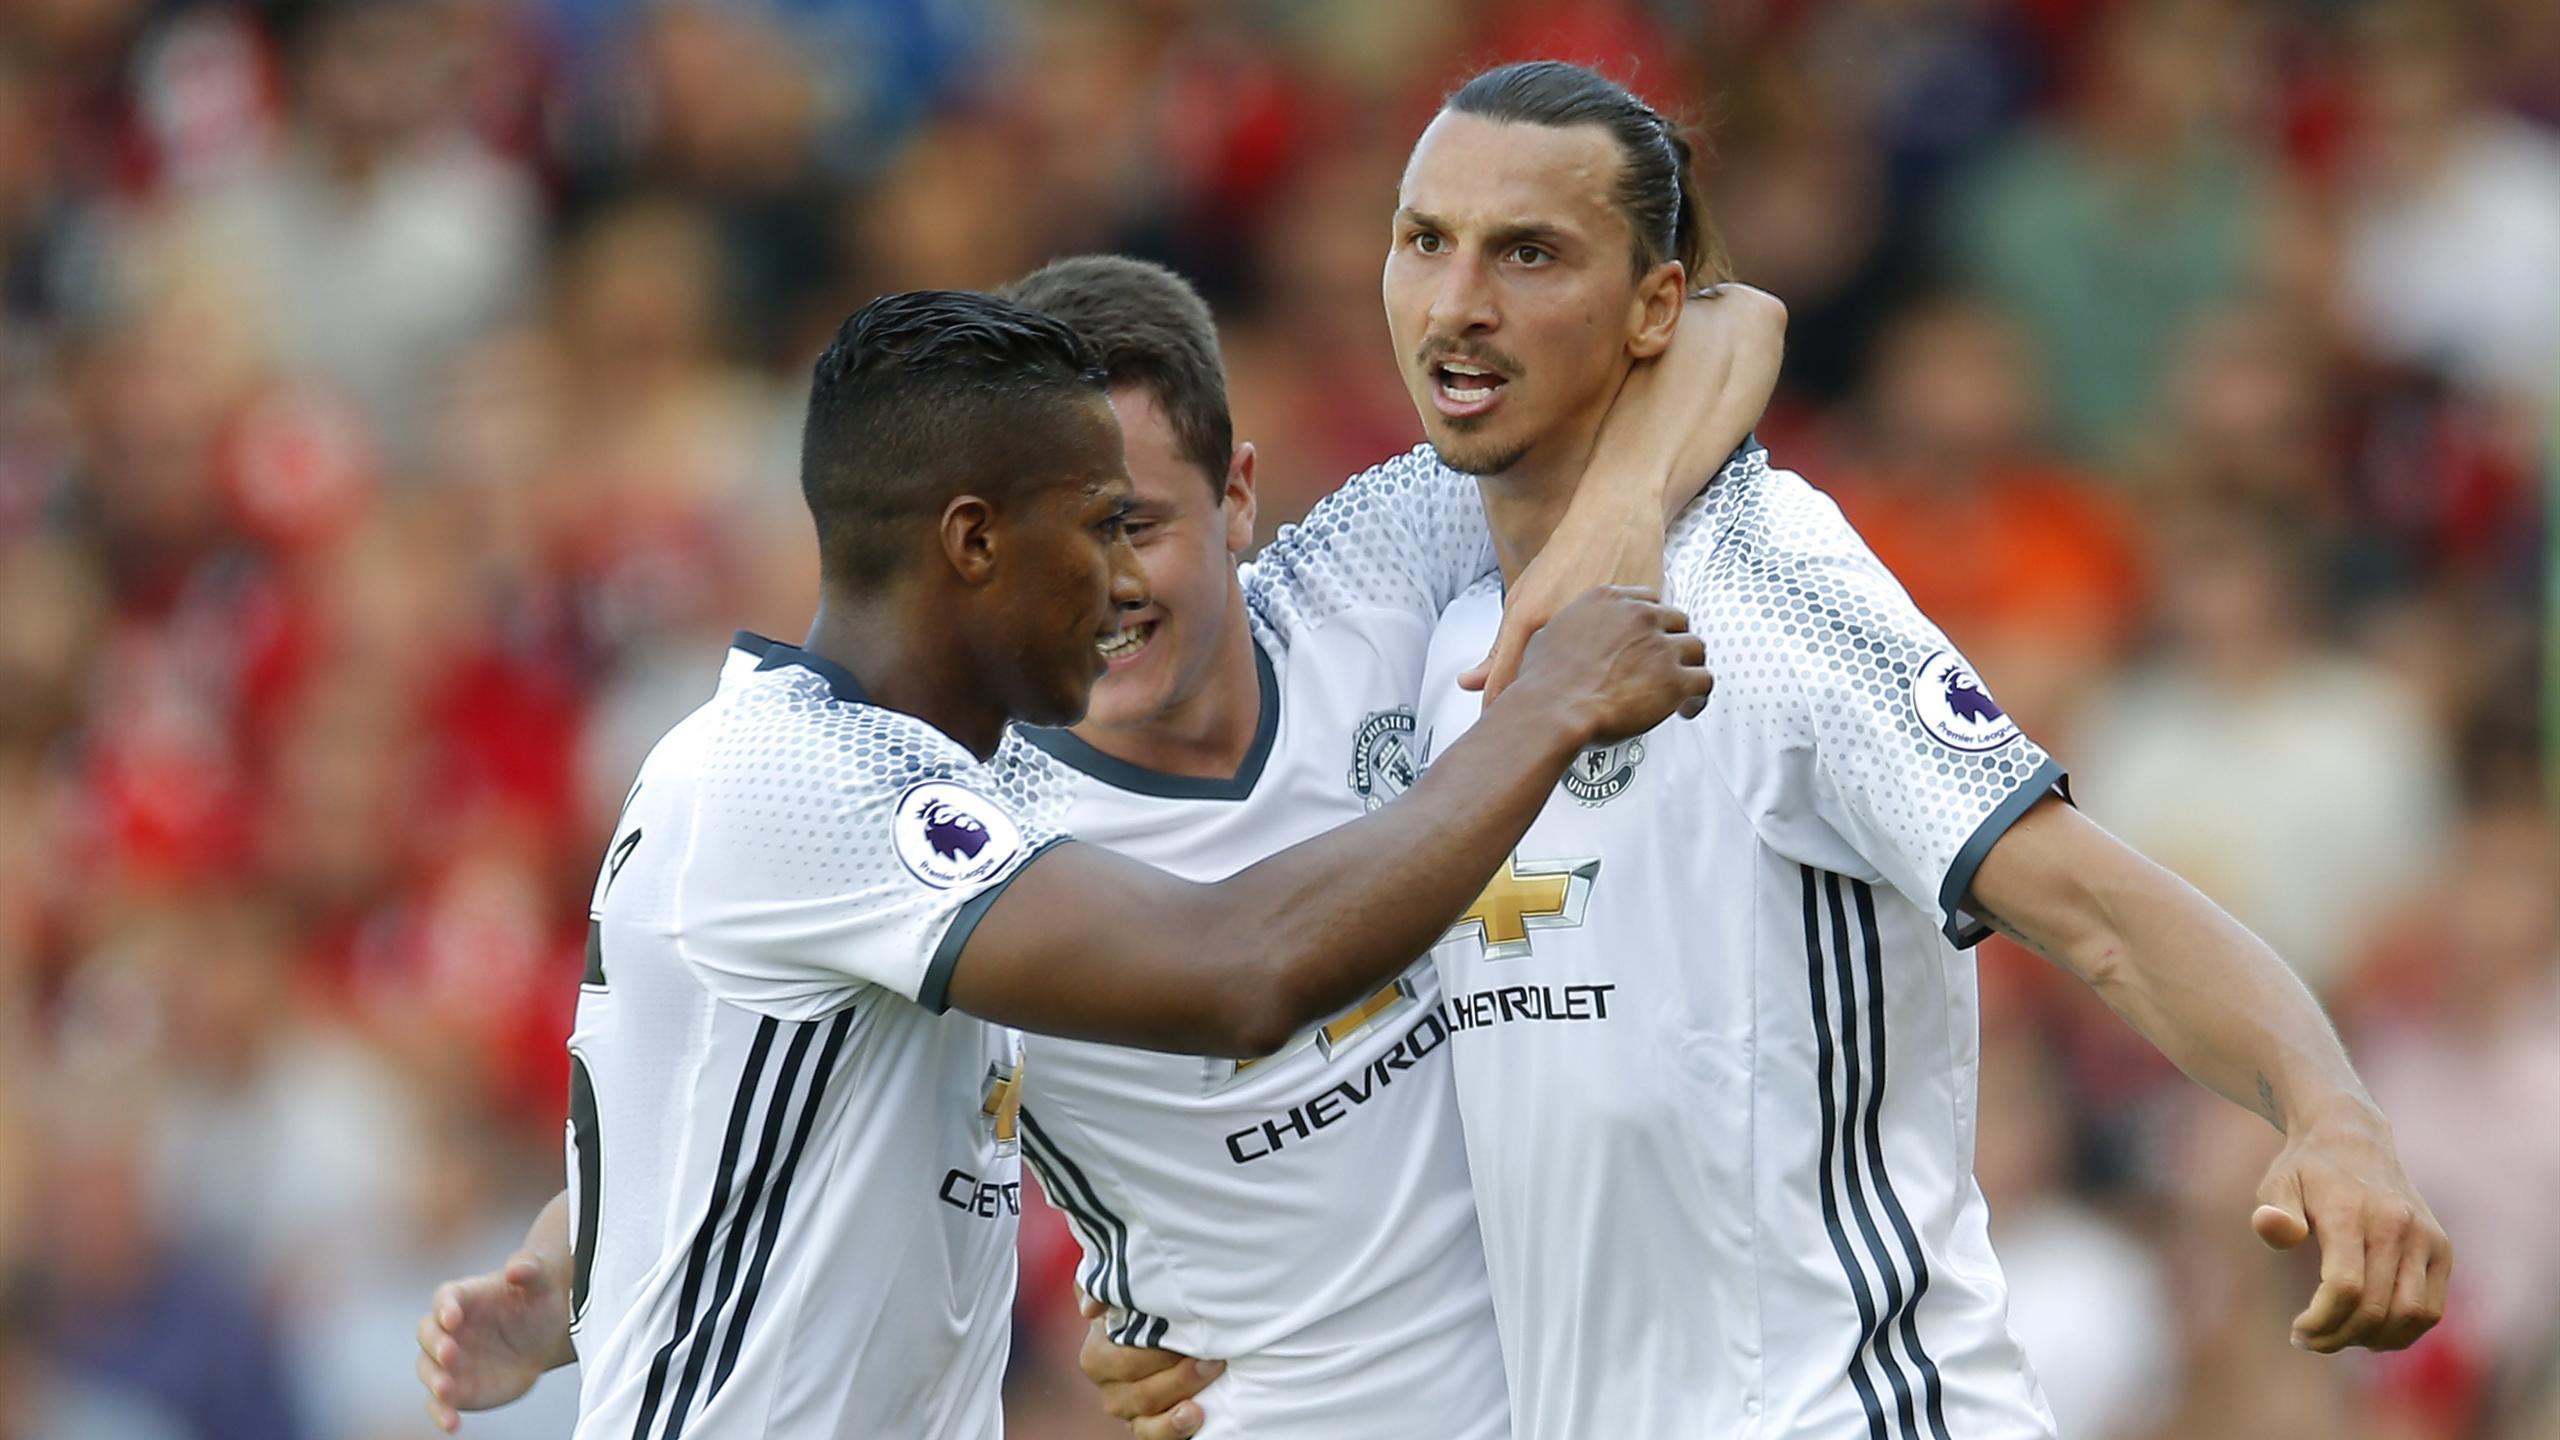 Zlatan Ibrahimovic celebrates his goal for Manchester United